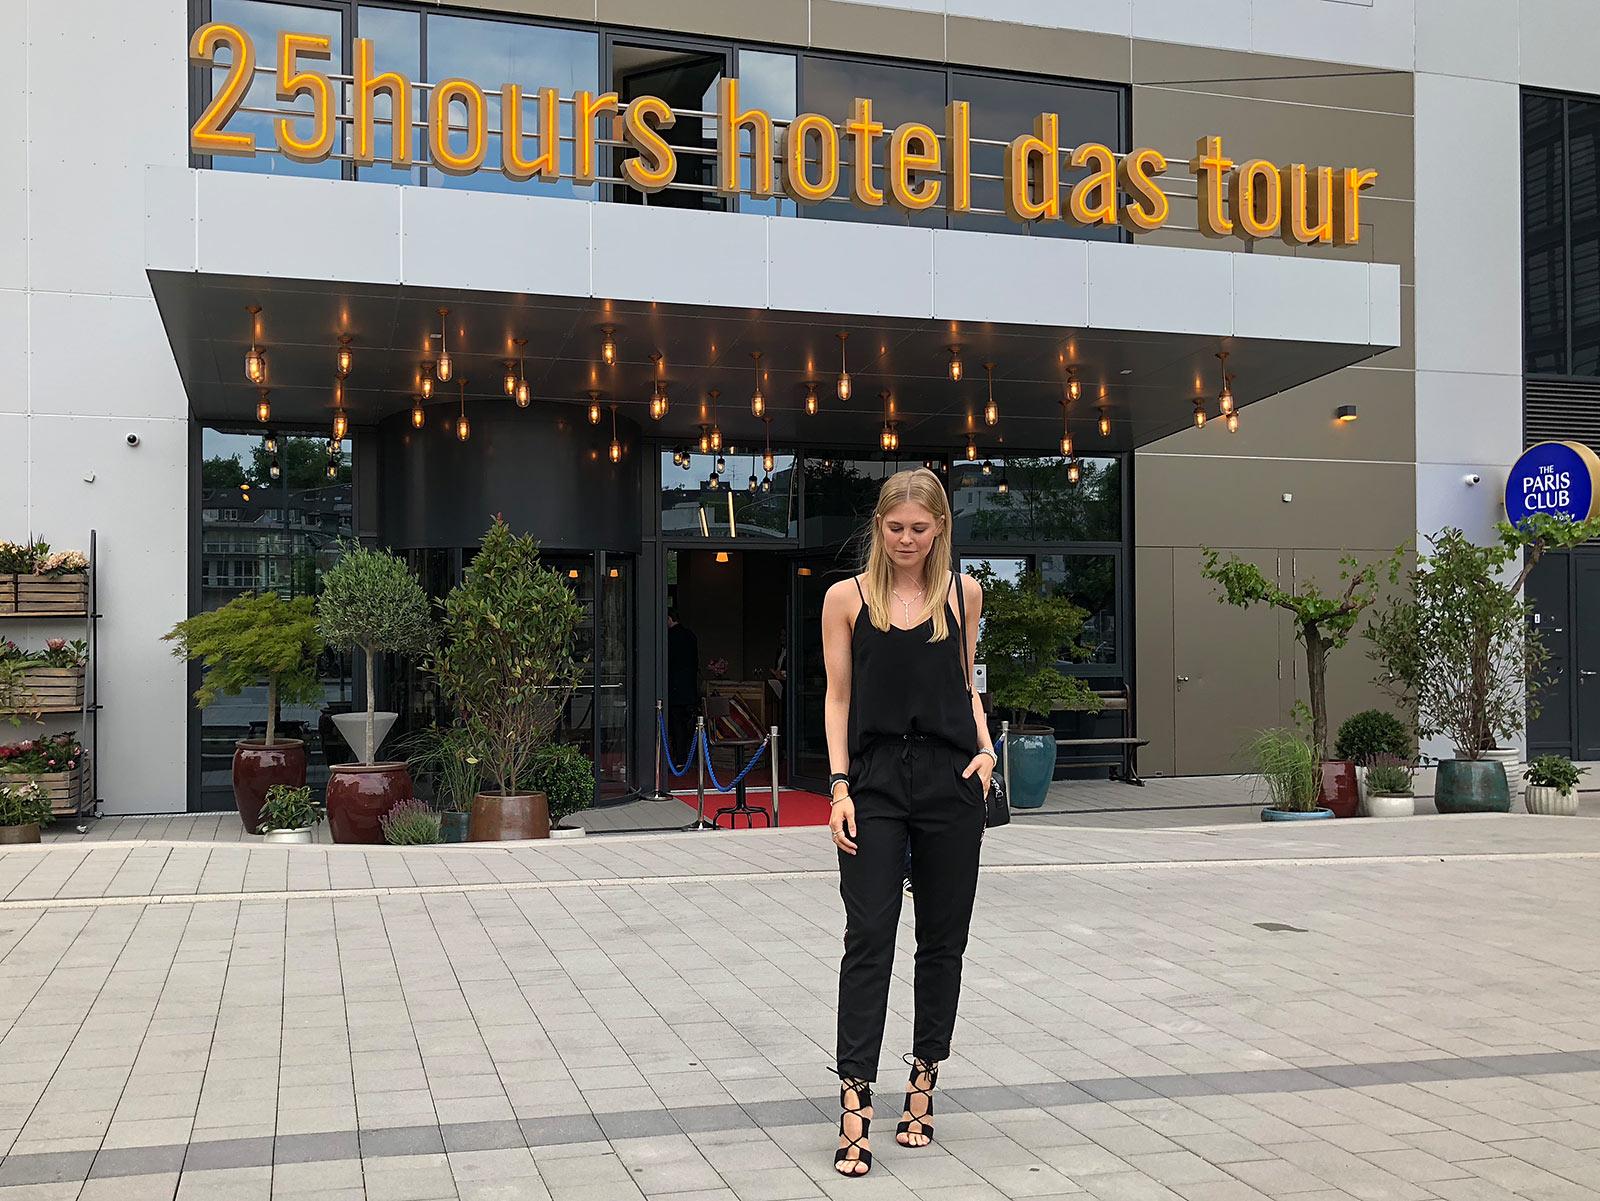 the paris club düsseldorf bar restaurant 25hours hotel sunnyinga